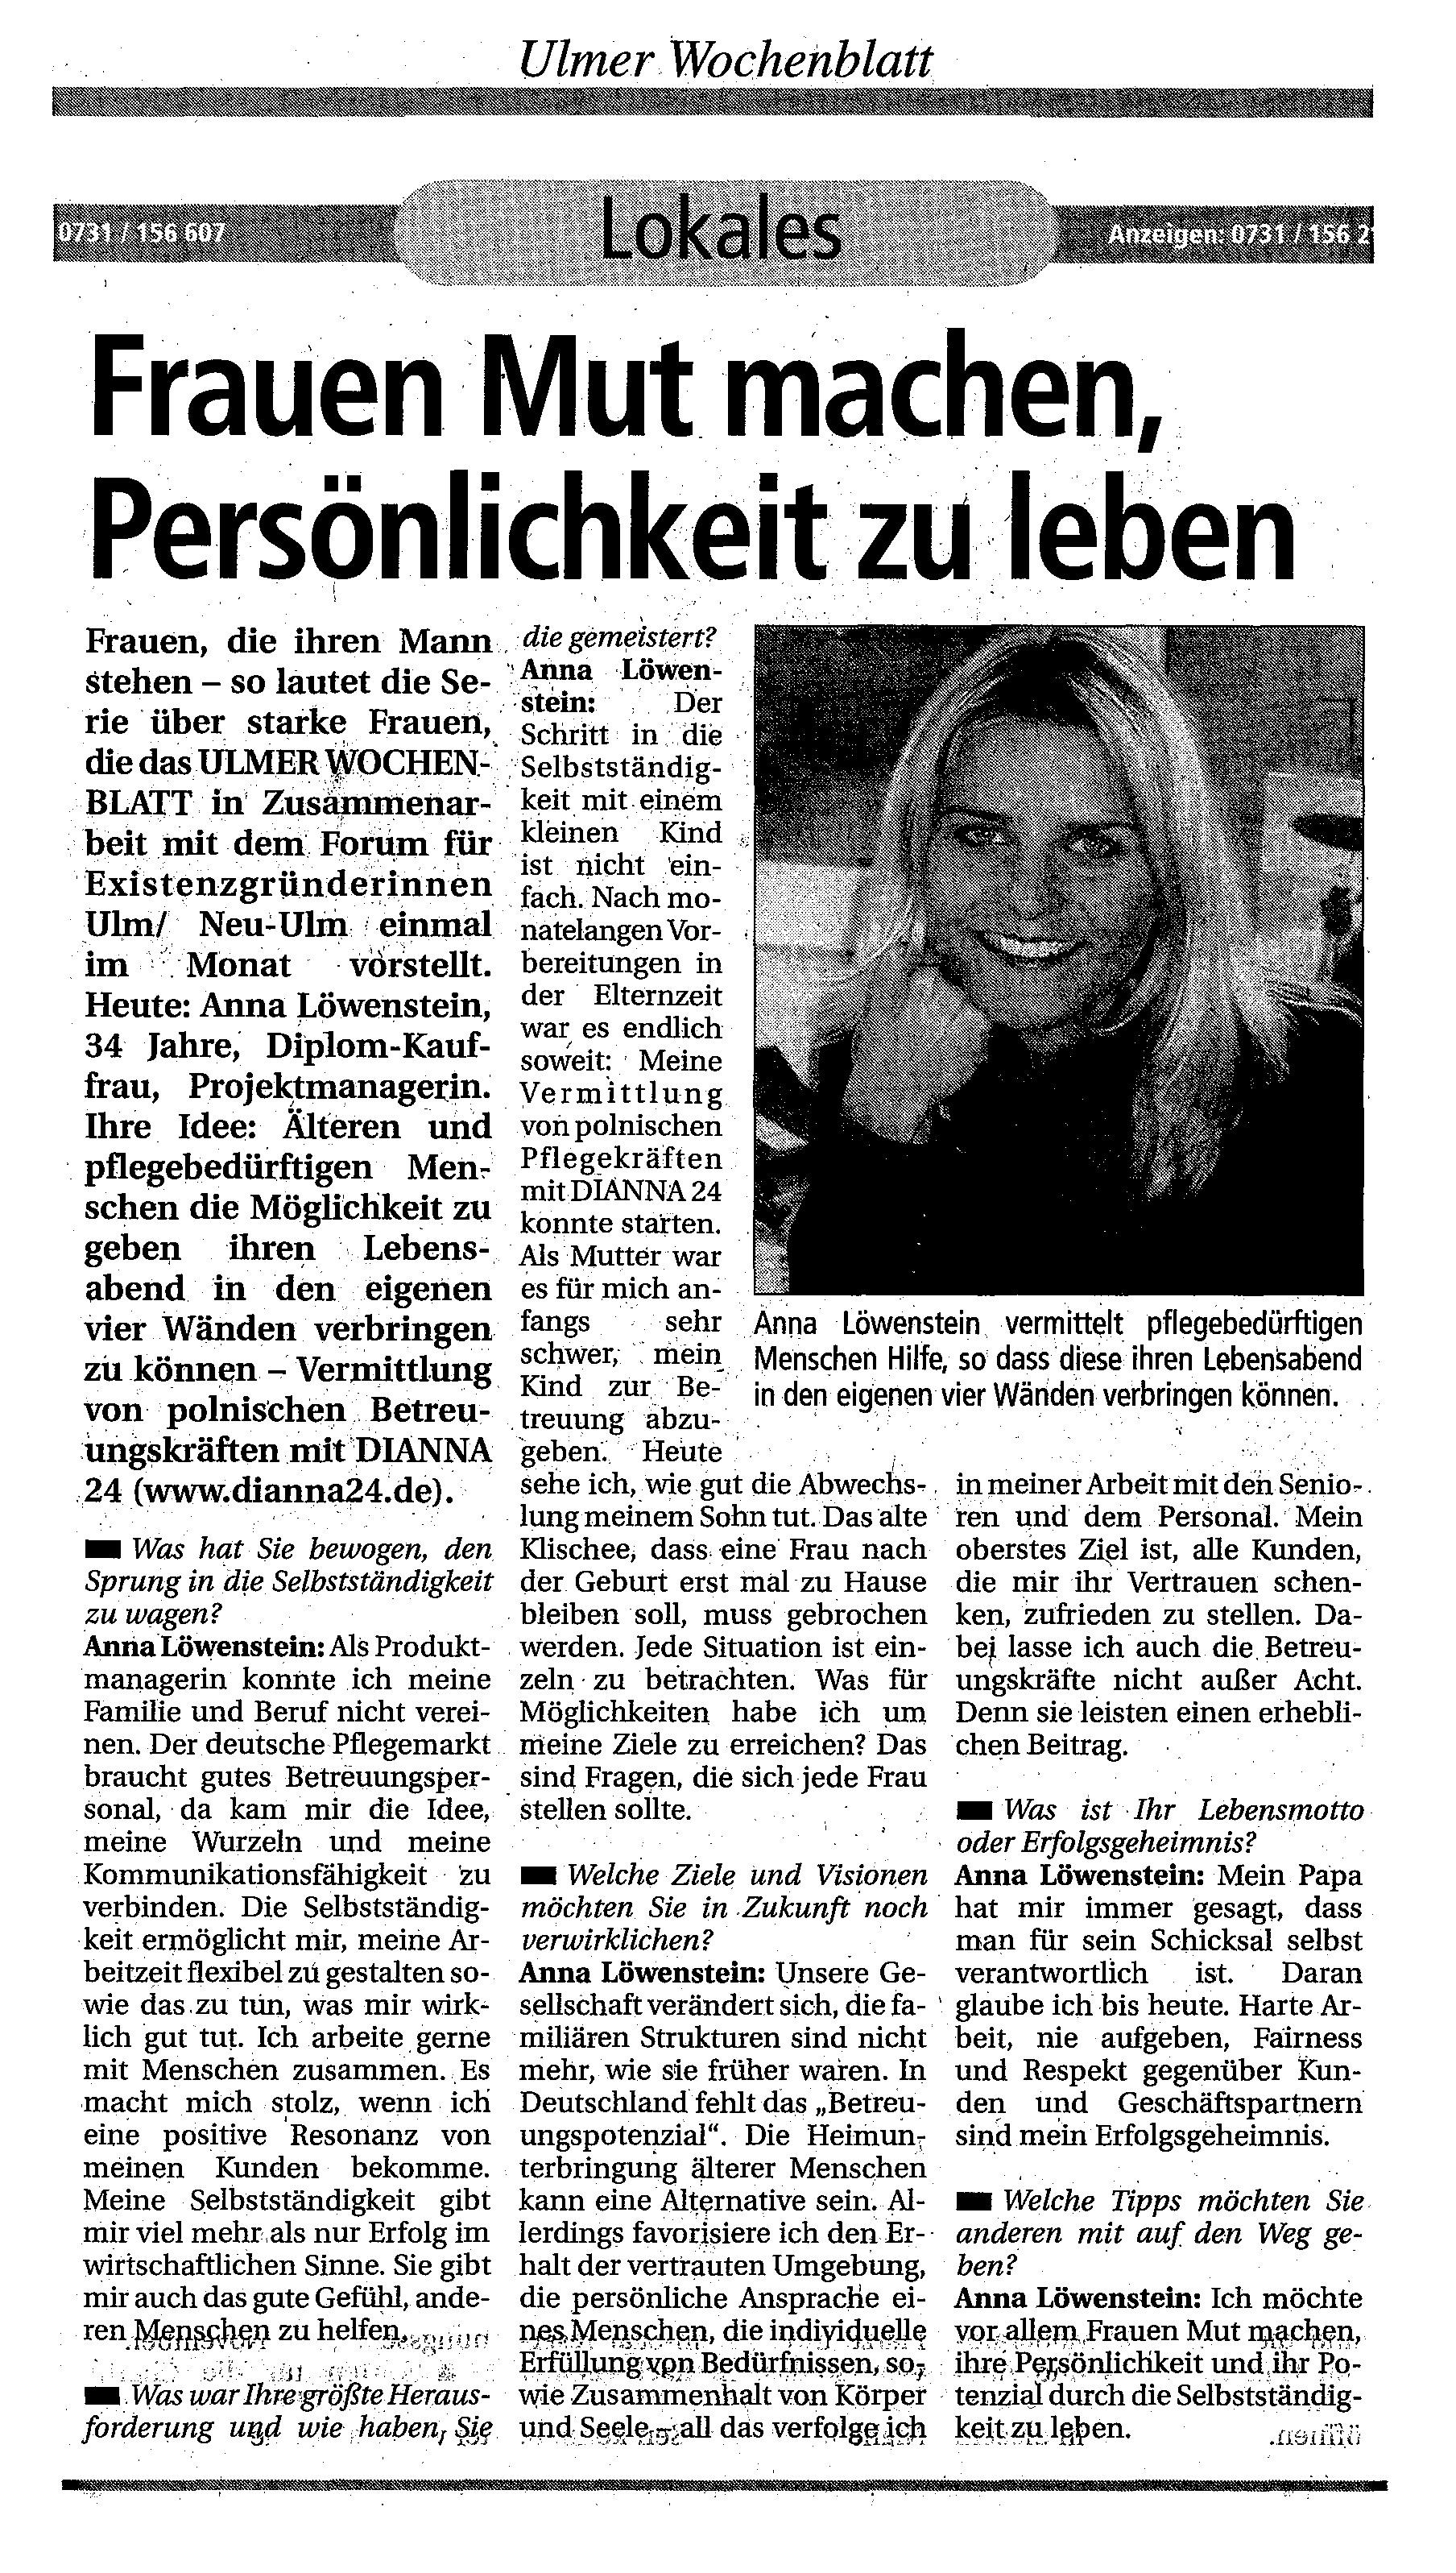 Ulmer wochenblatt bekanntschaften